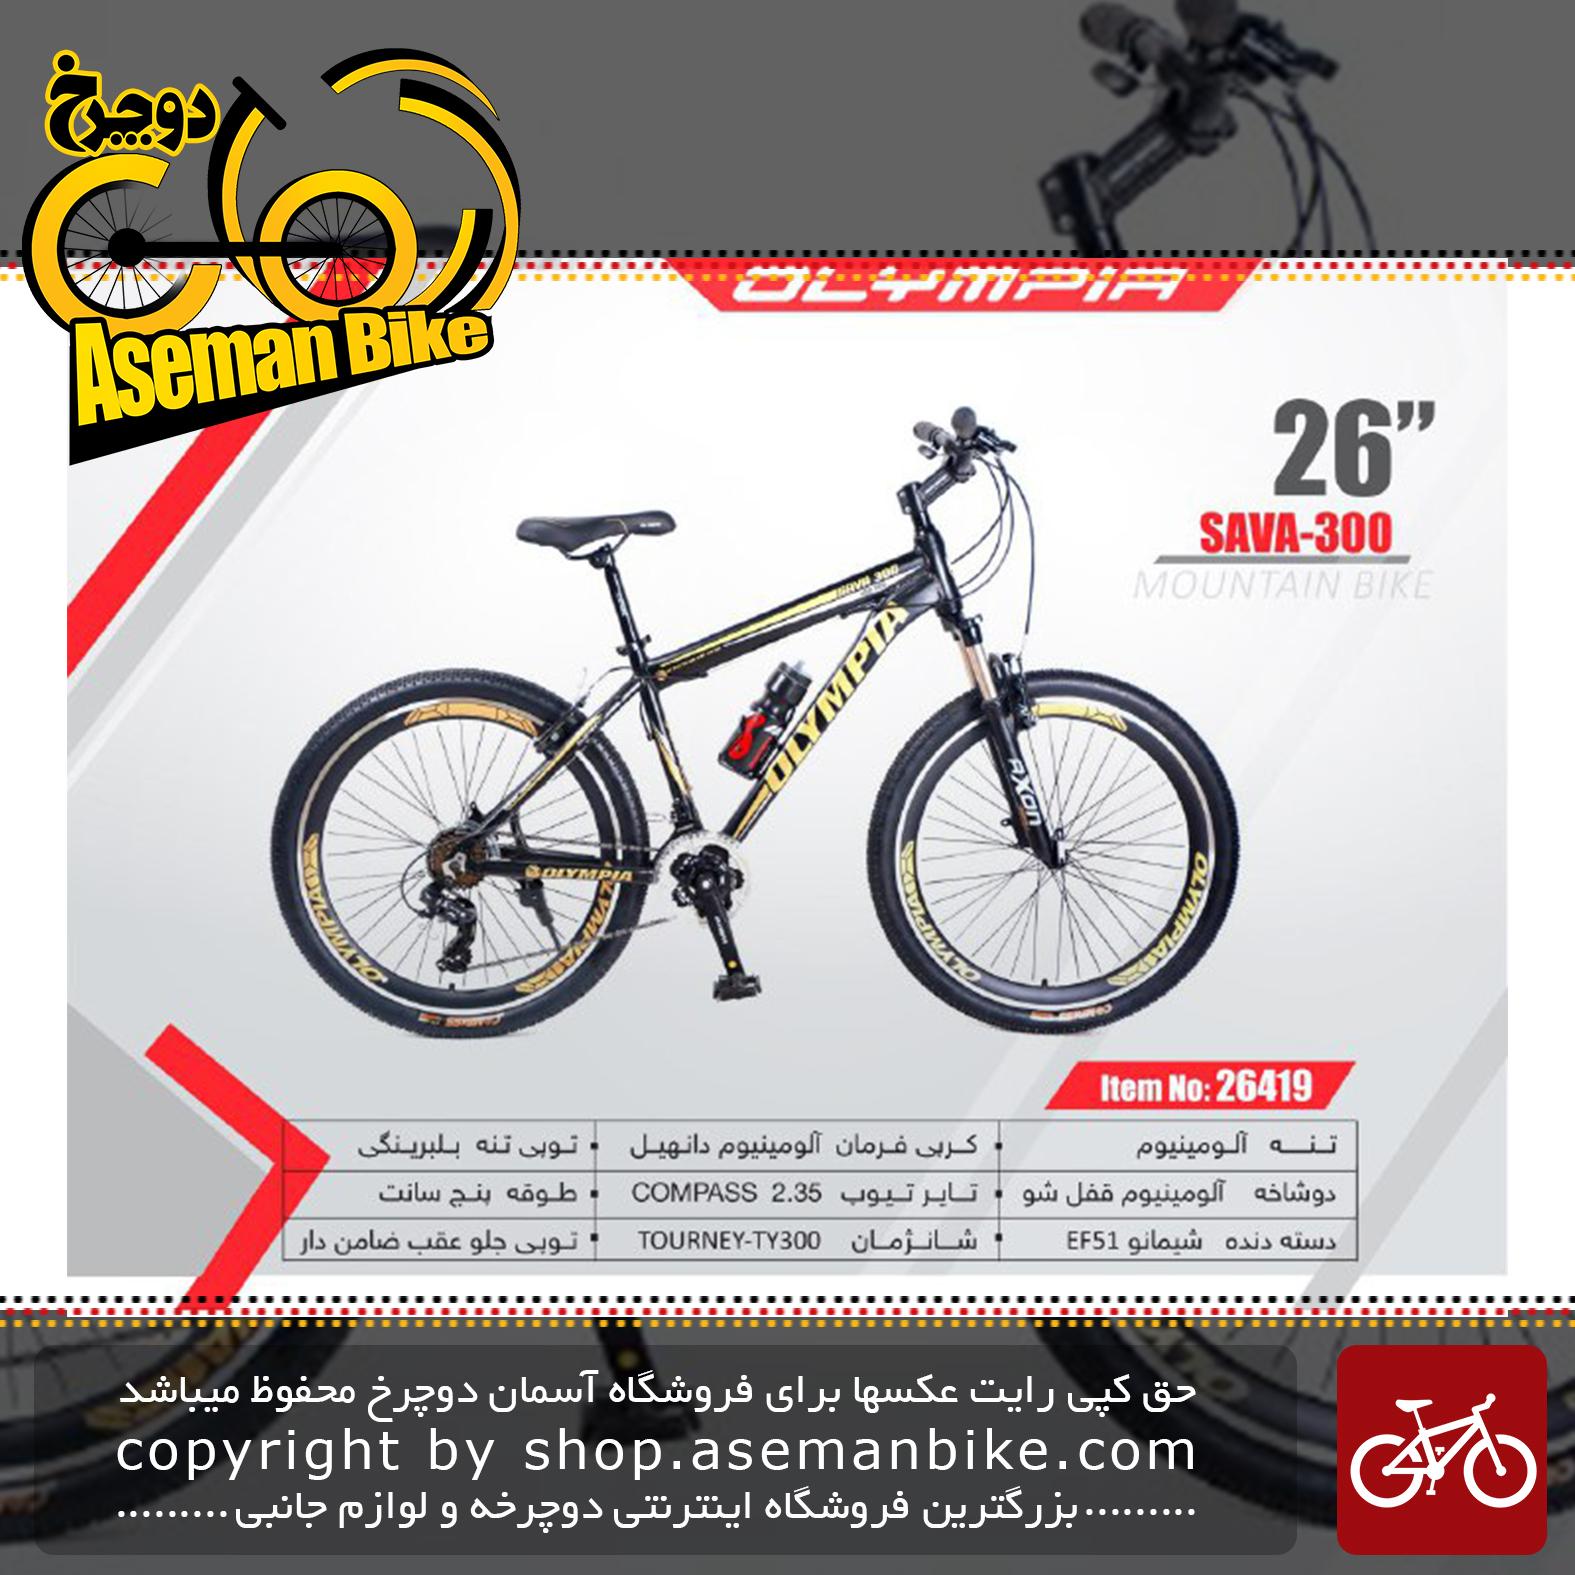 دوچرخه کوهستان المپیا سایز 26مدل ساوا 300 300 OLYMPIA SIZE 26 SAVA